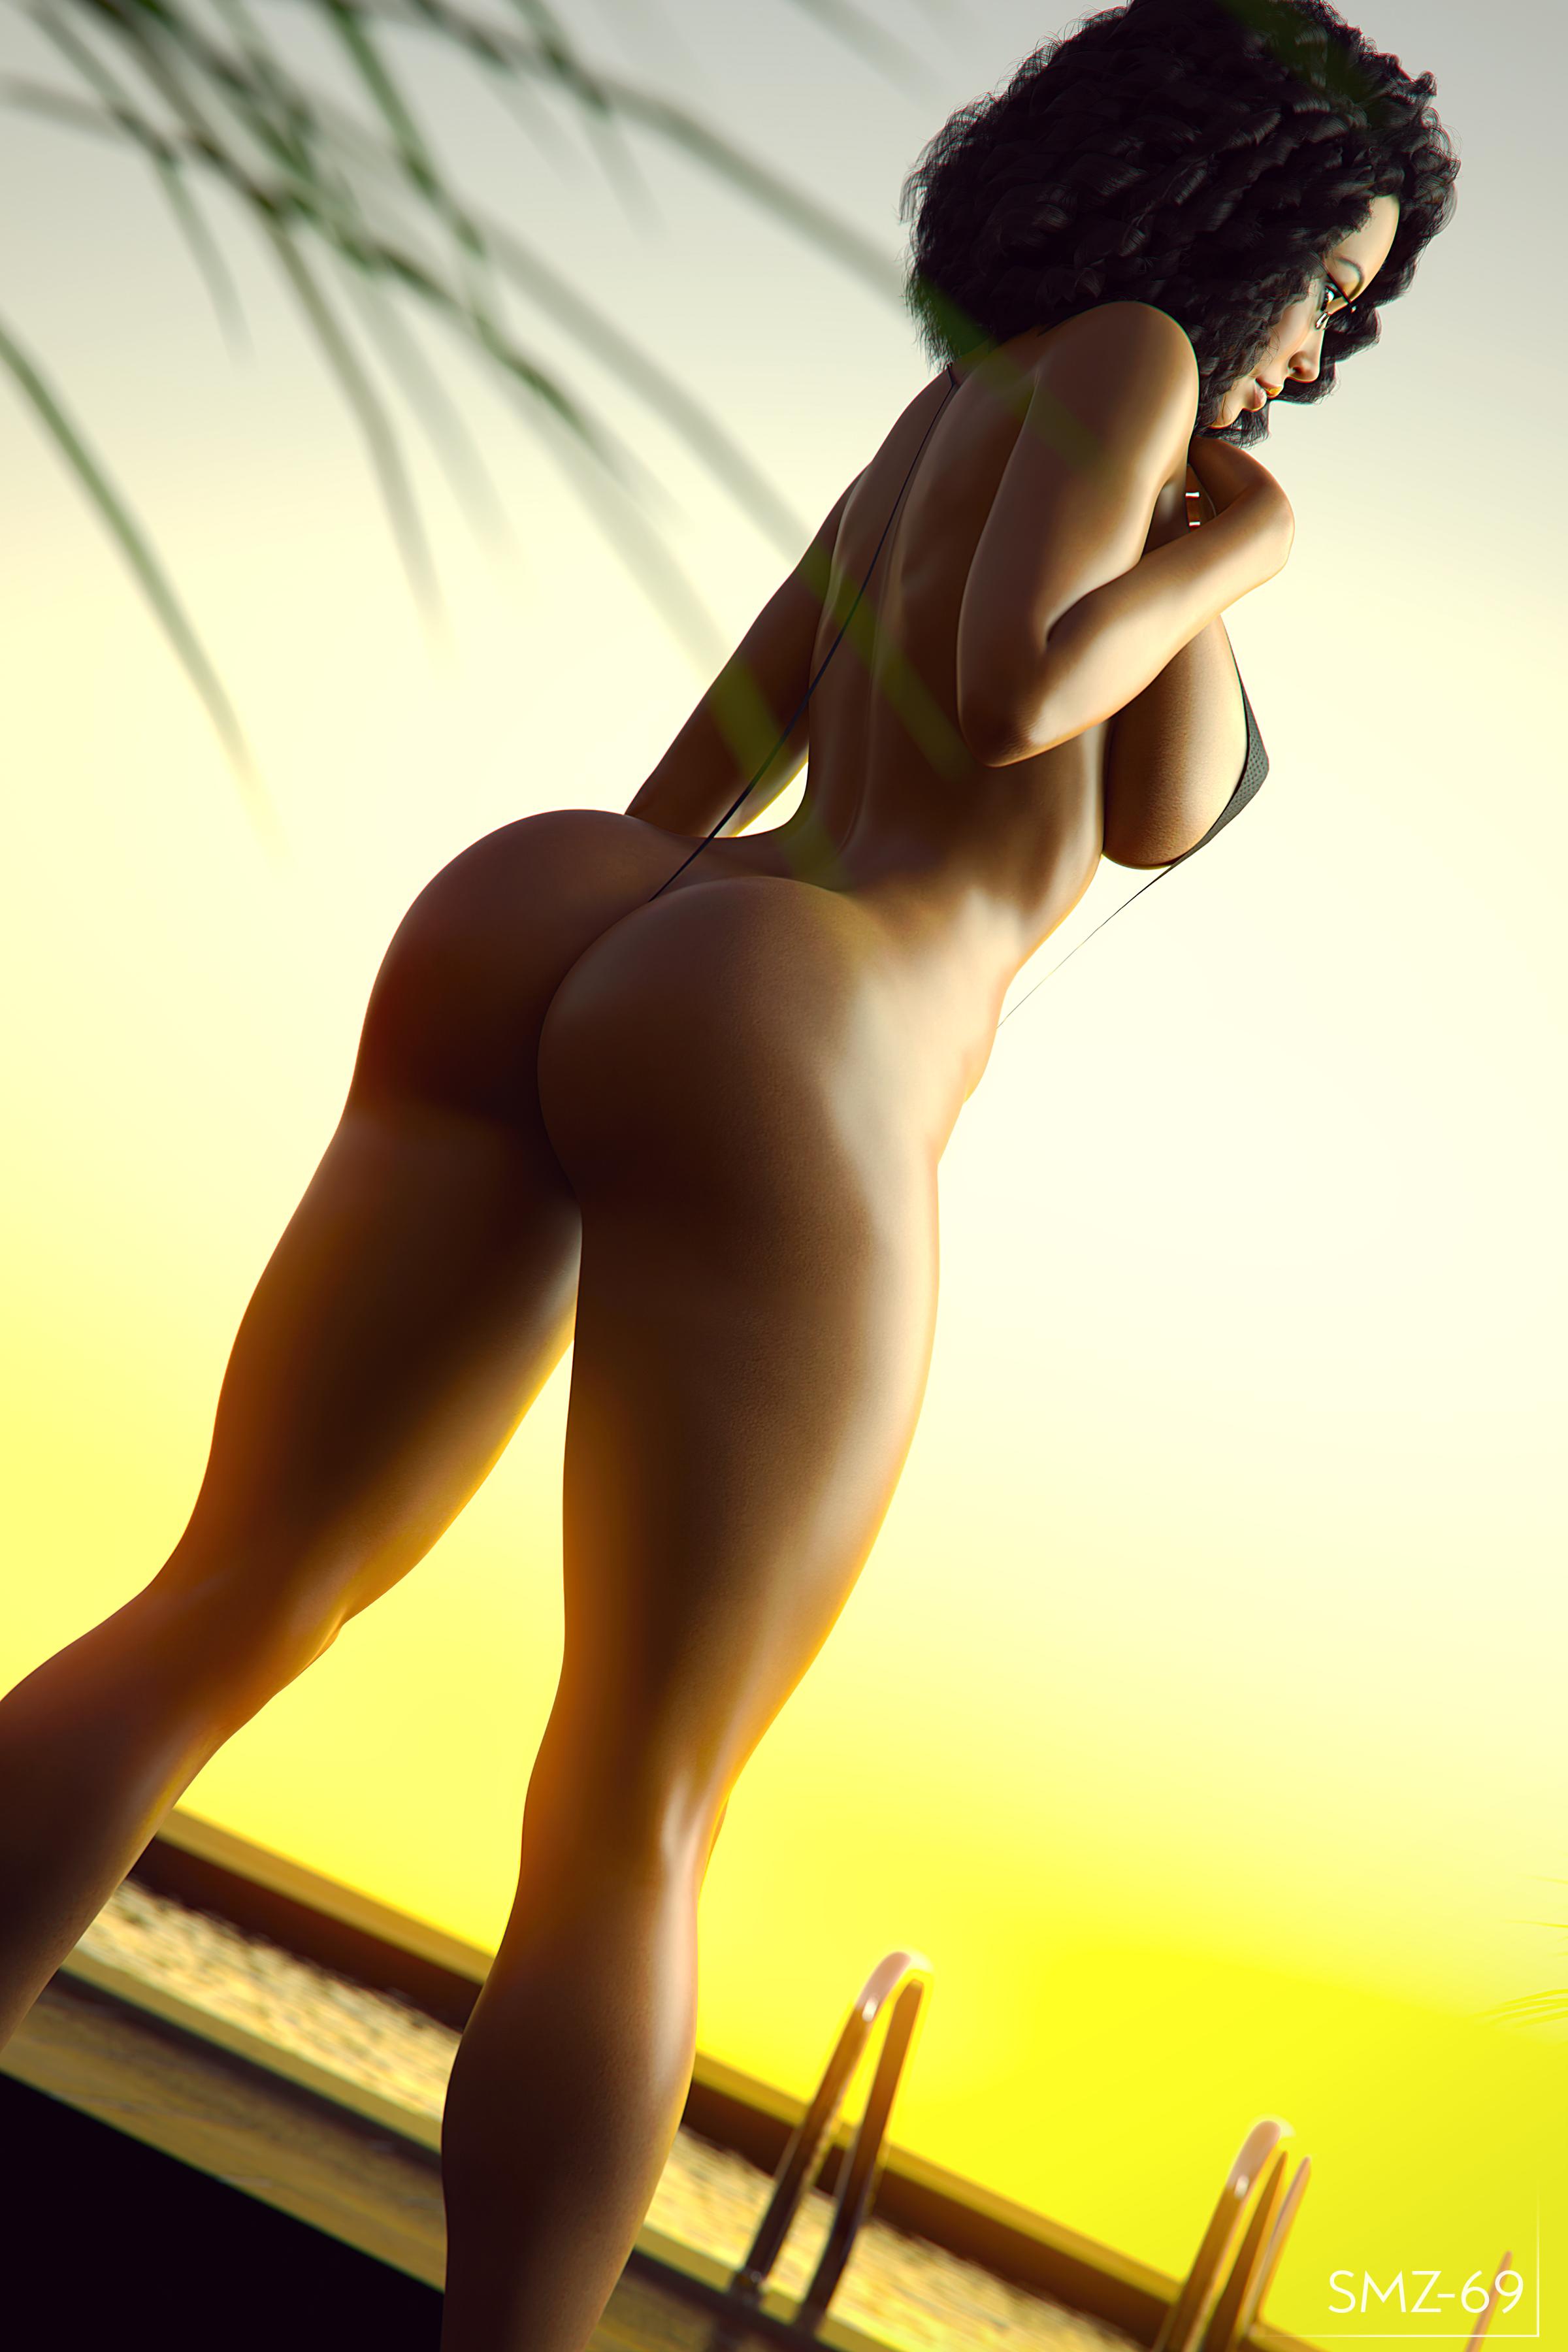 Melissa - Enjoying the View